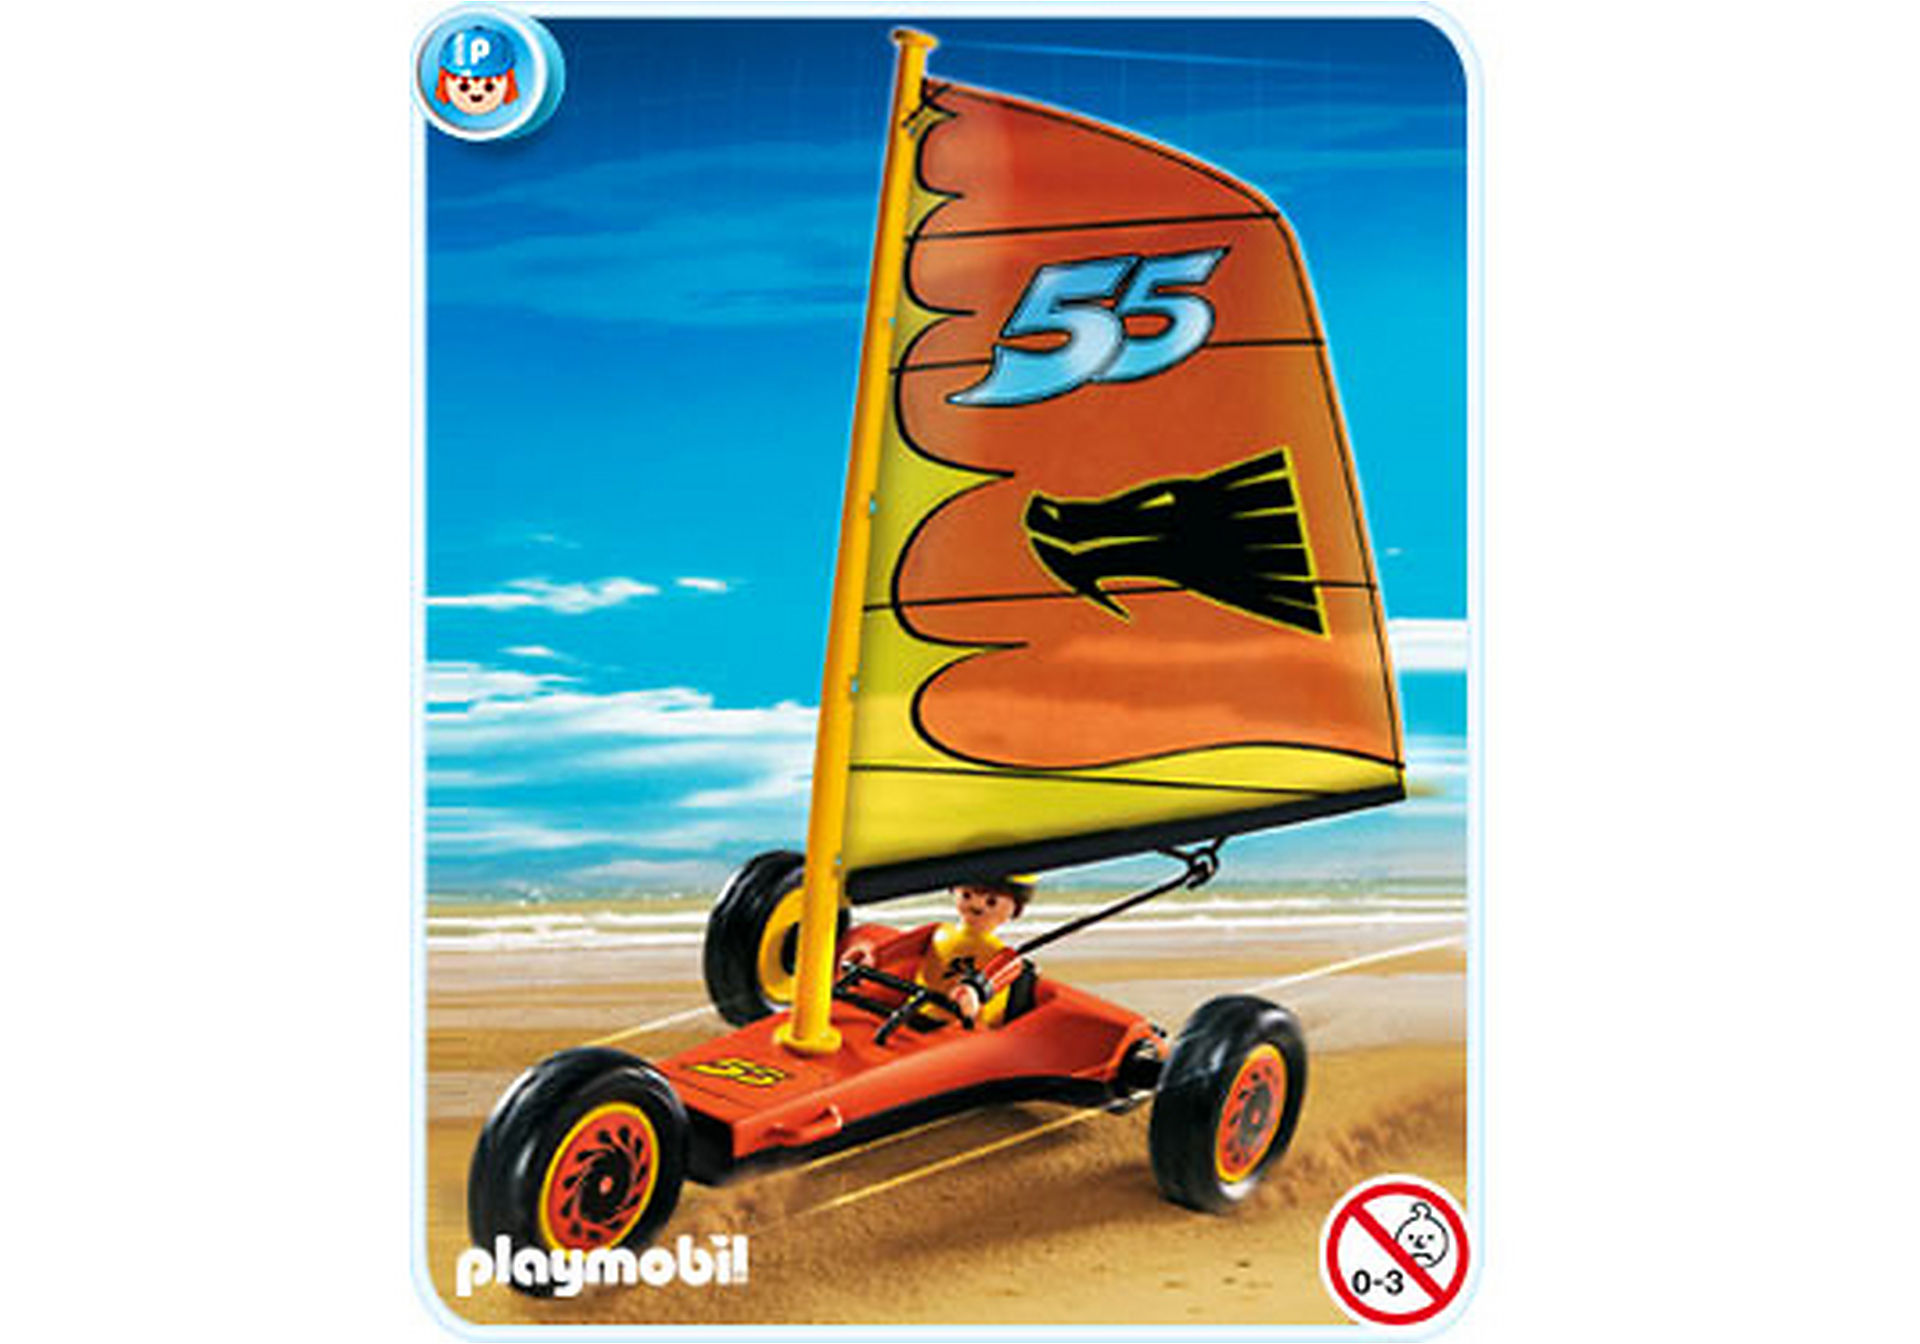 http://media.playmobil.com/i/playmobil/4216-A_product_detail/Windracer